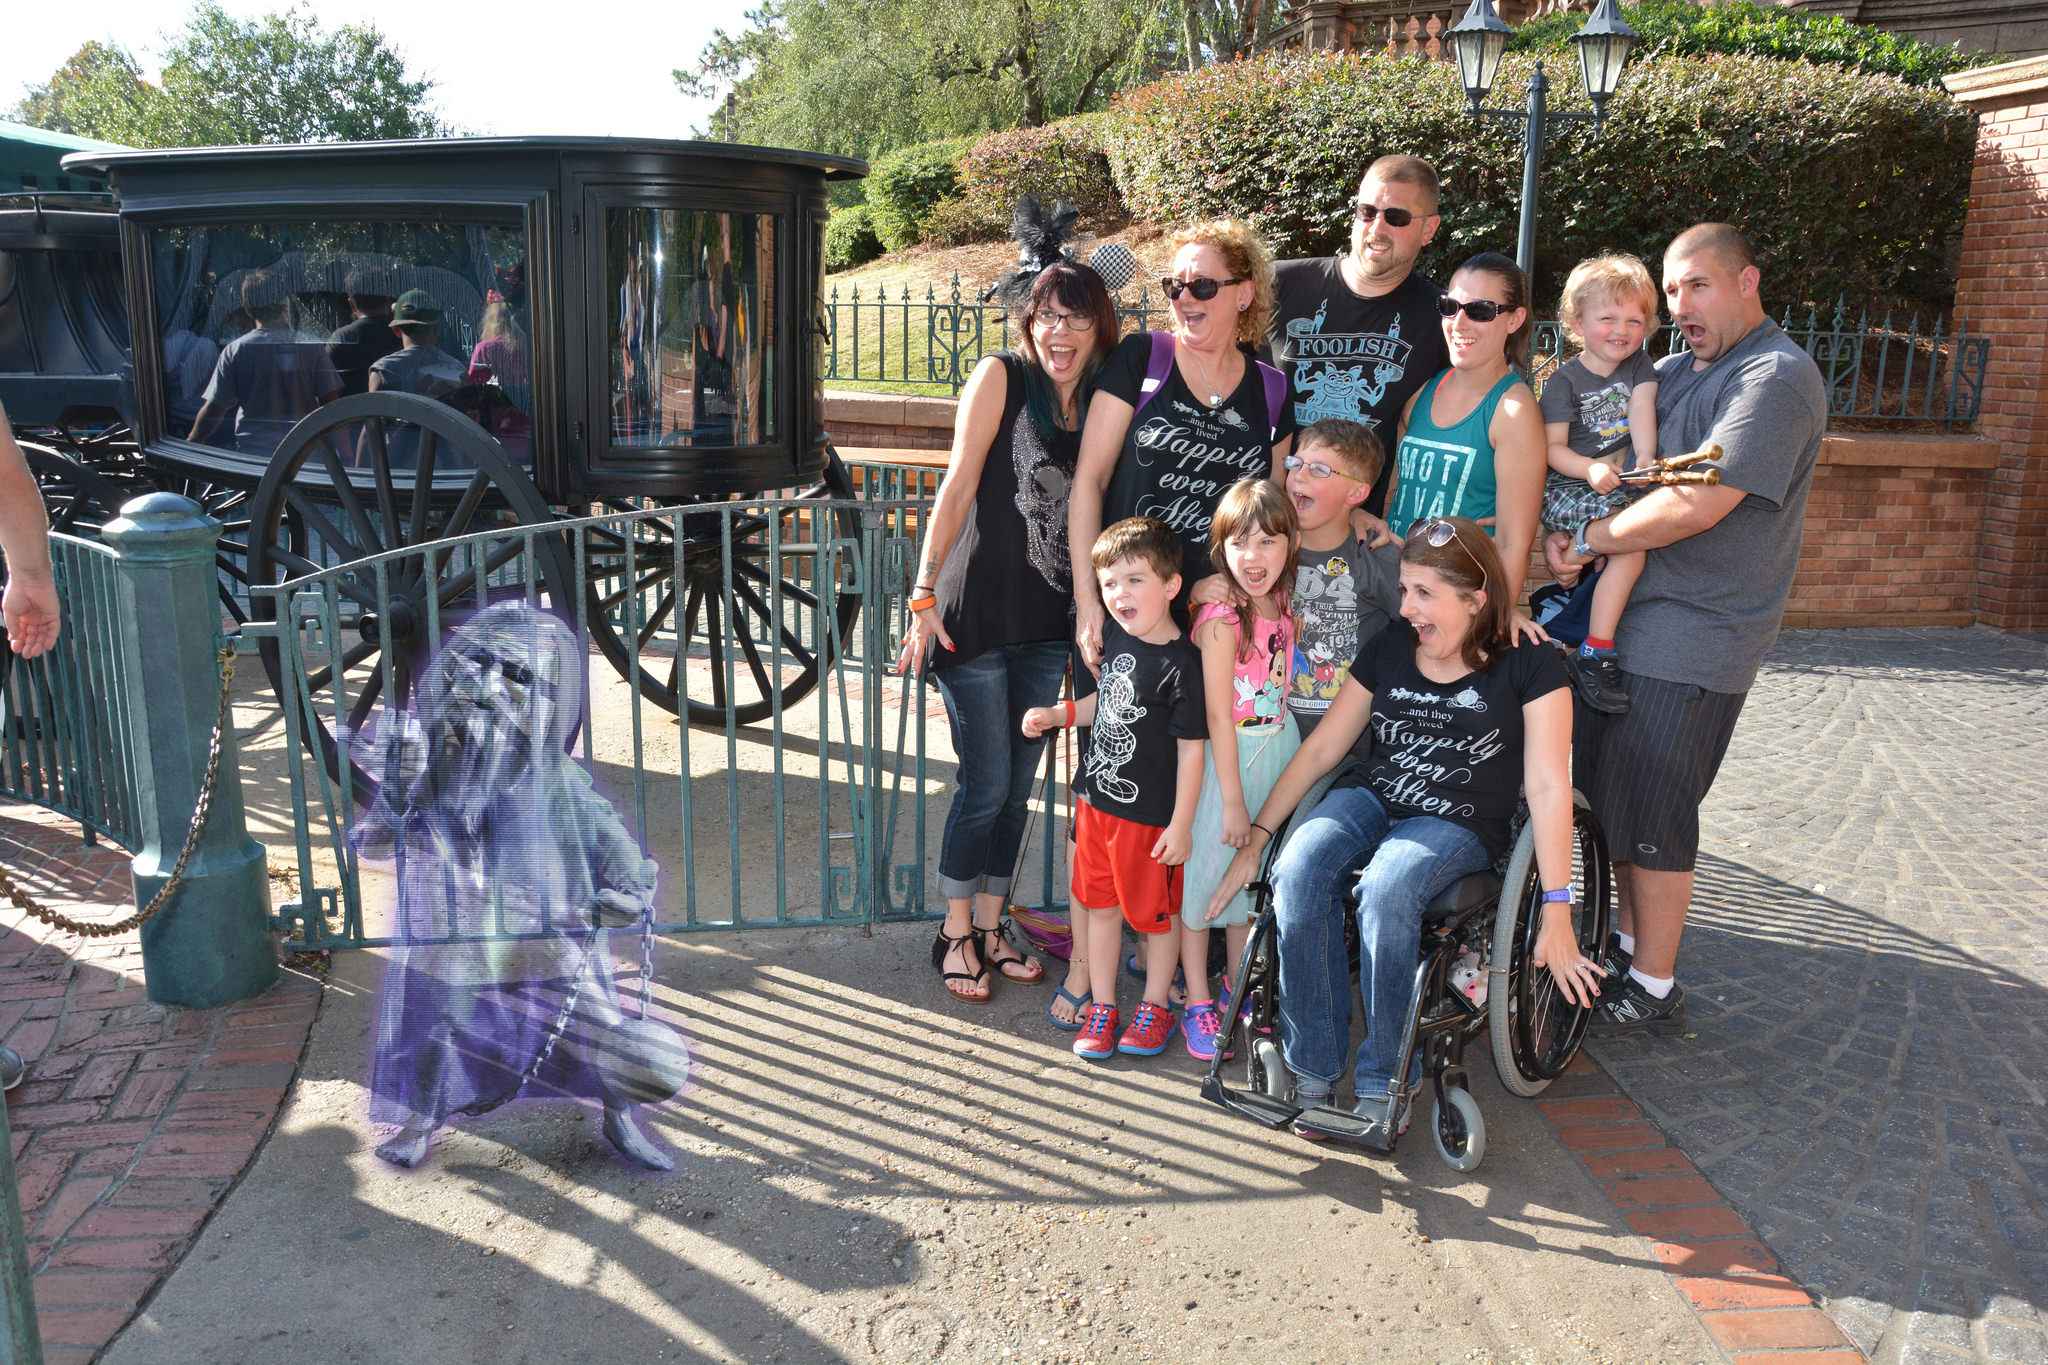 Disney magic Shot photo Haunted Mansion